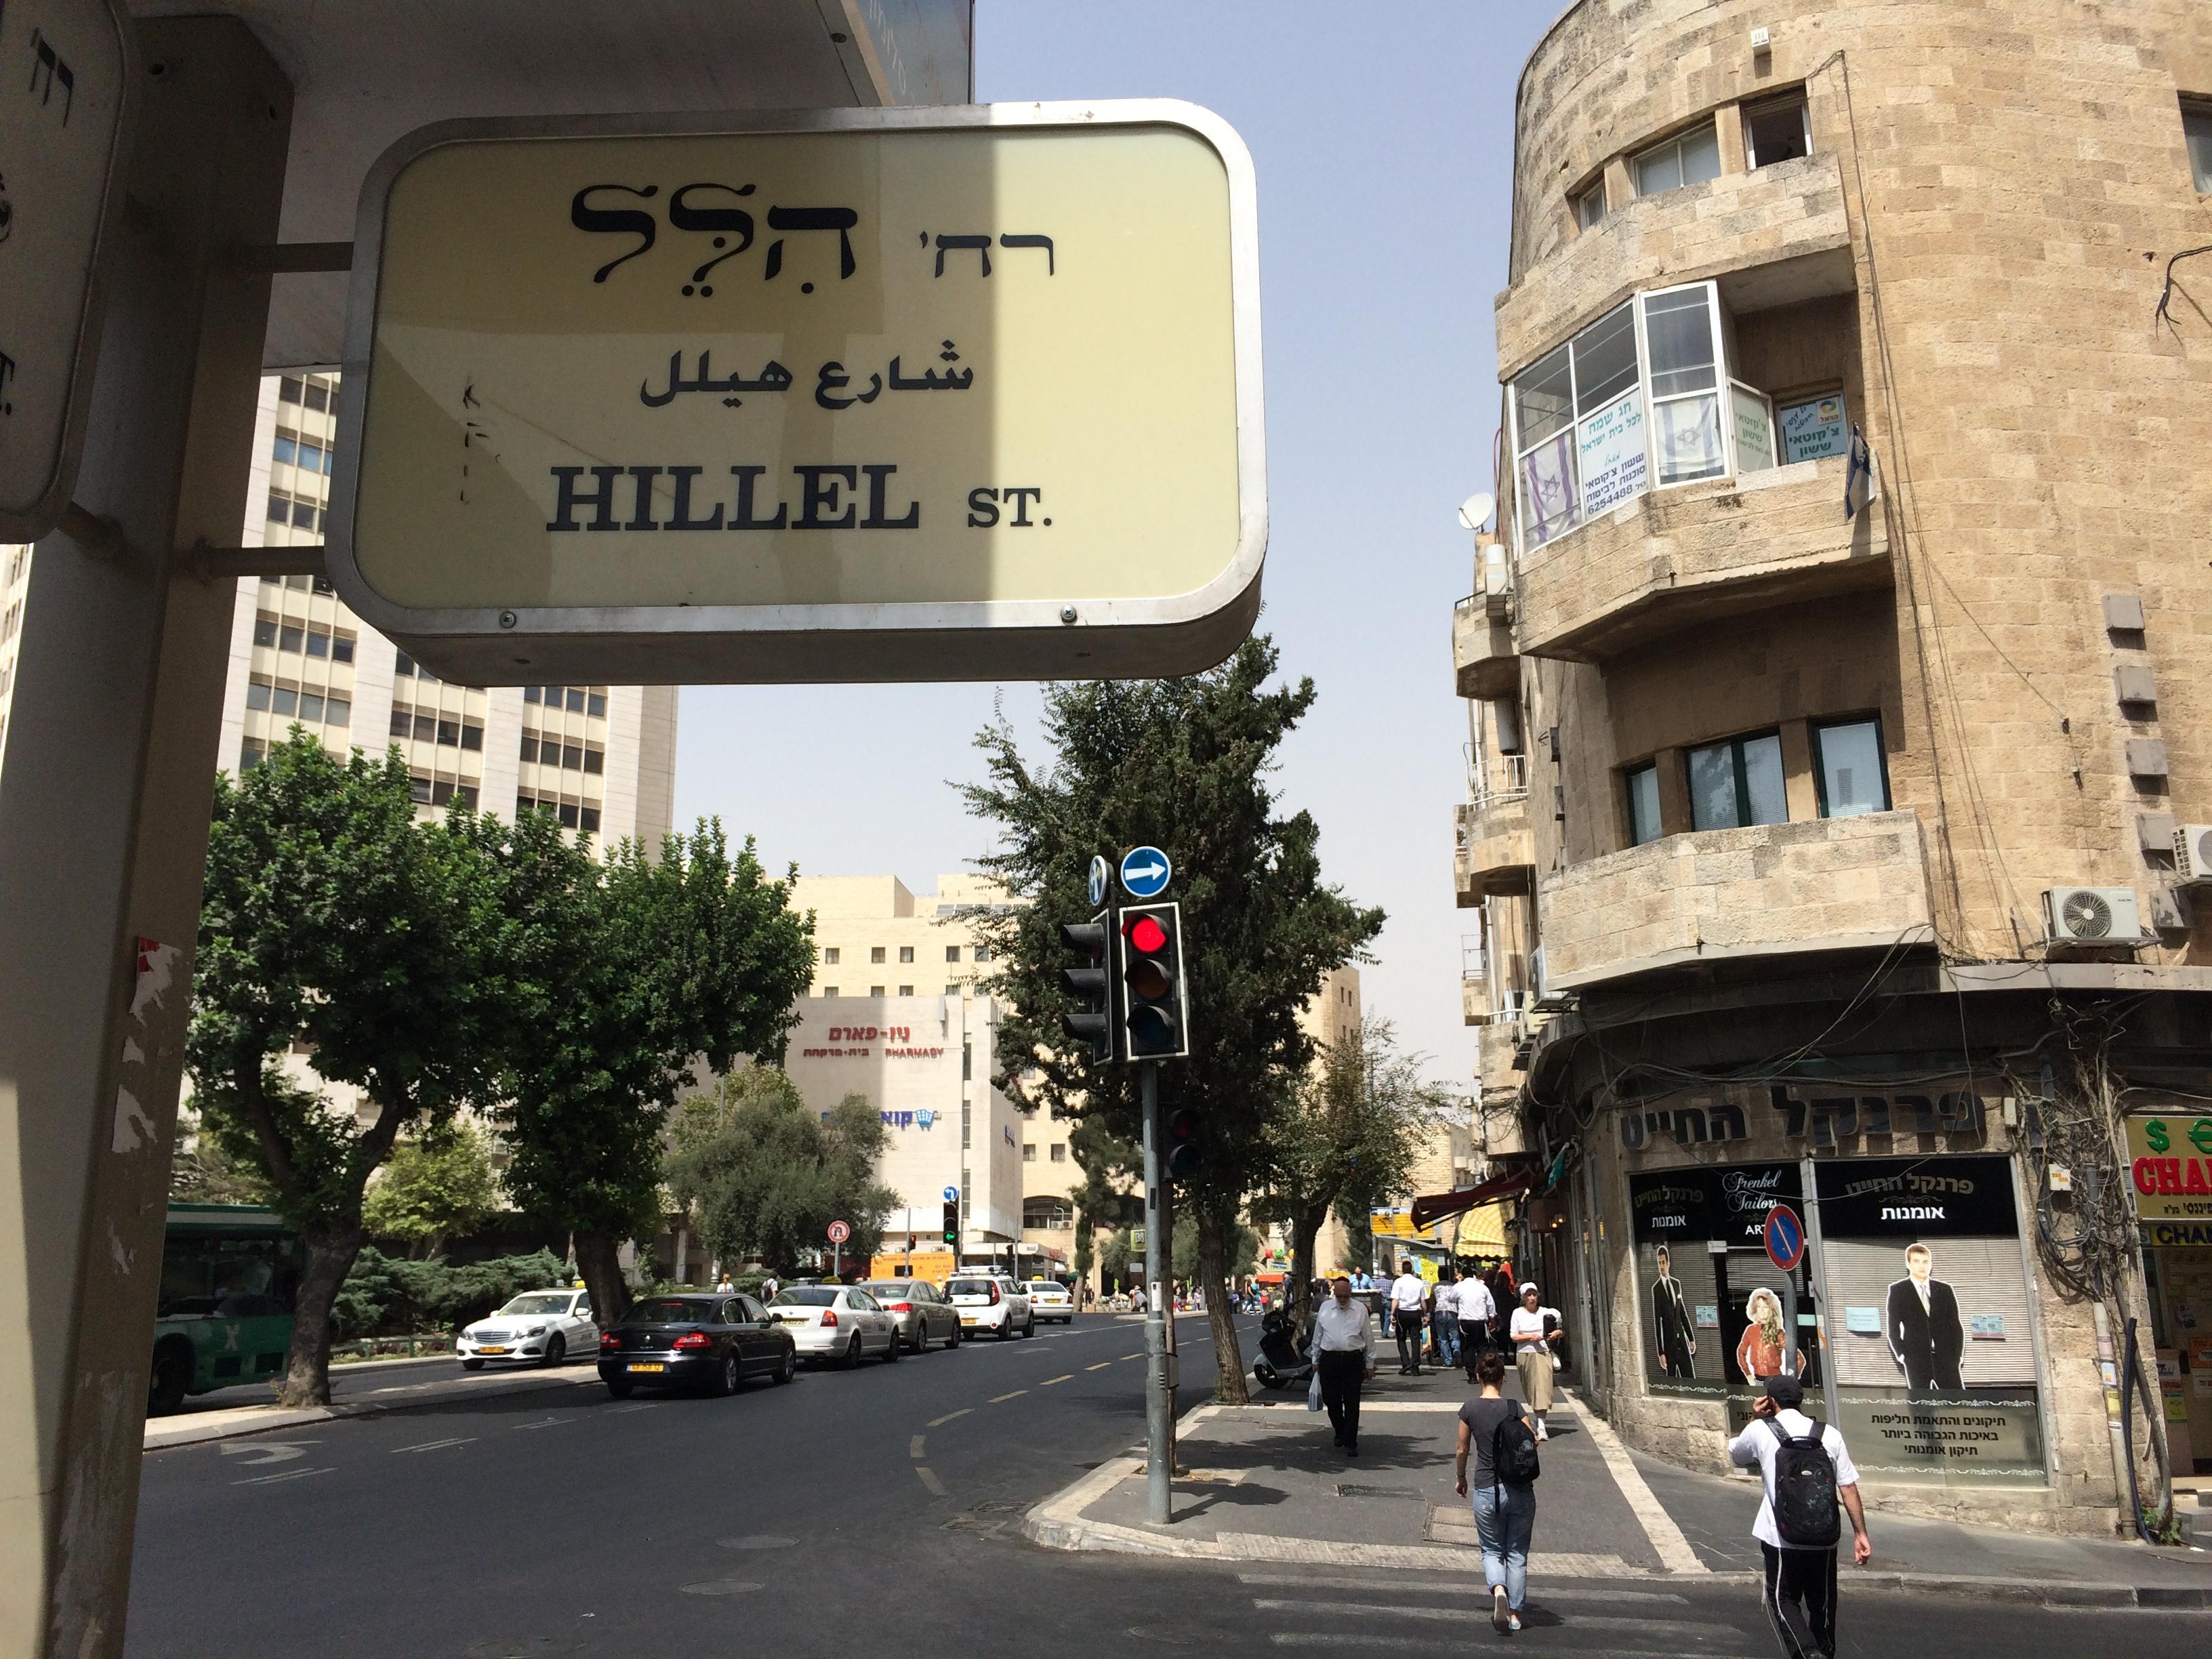 Jutzot Ierushalaim – VIII – Las calles de Jerusalém: Hilel